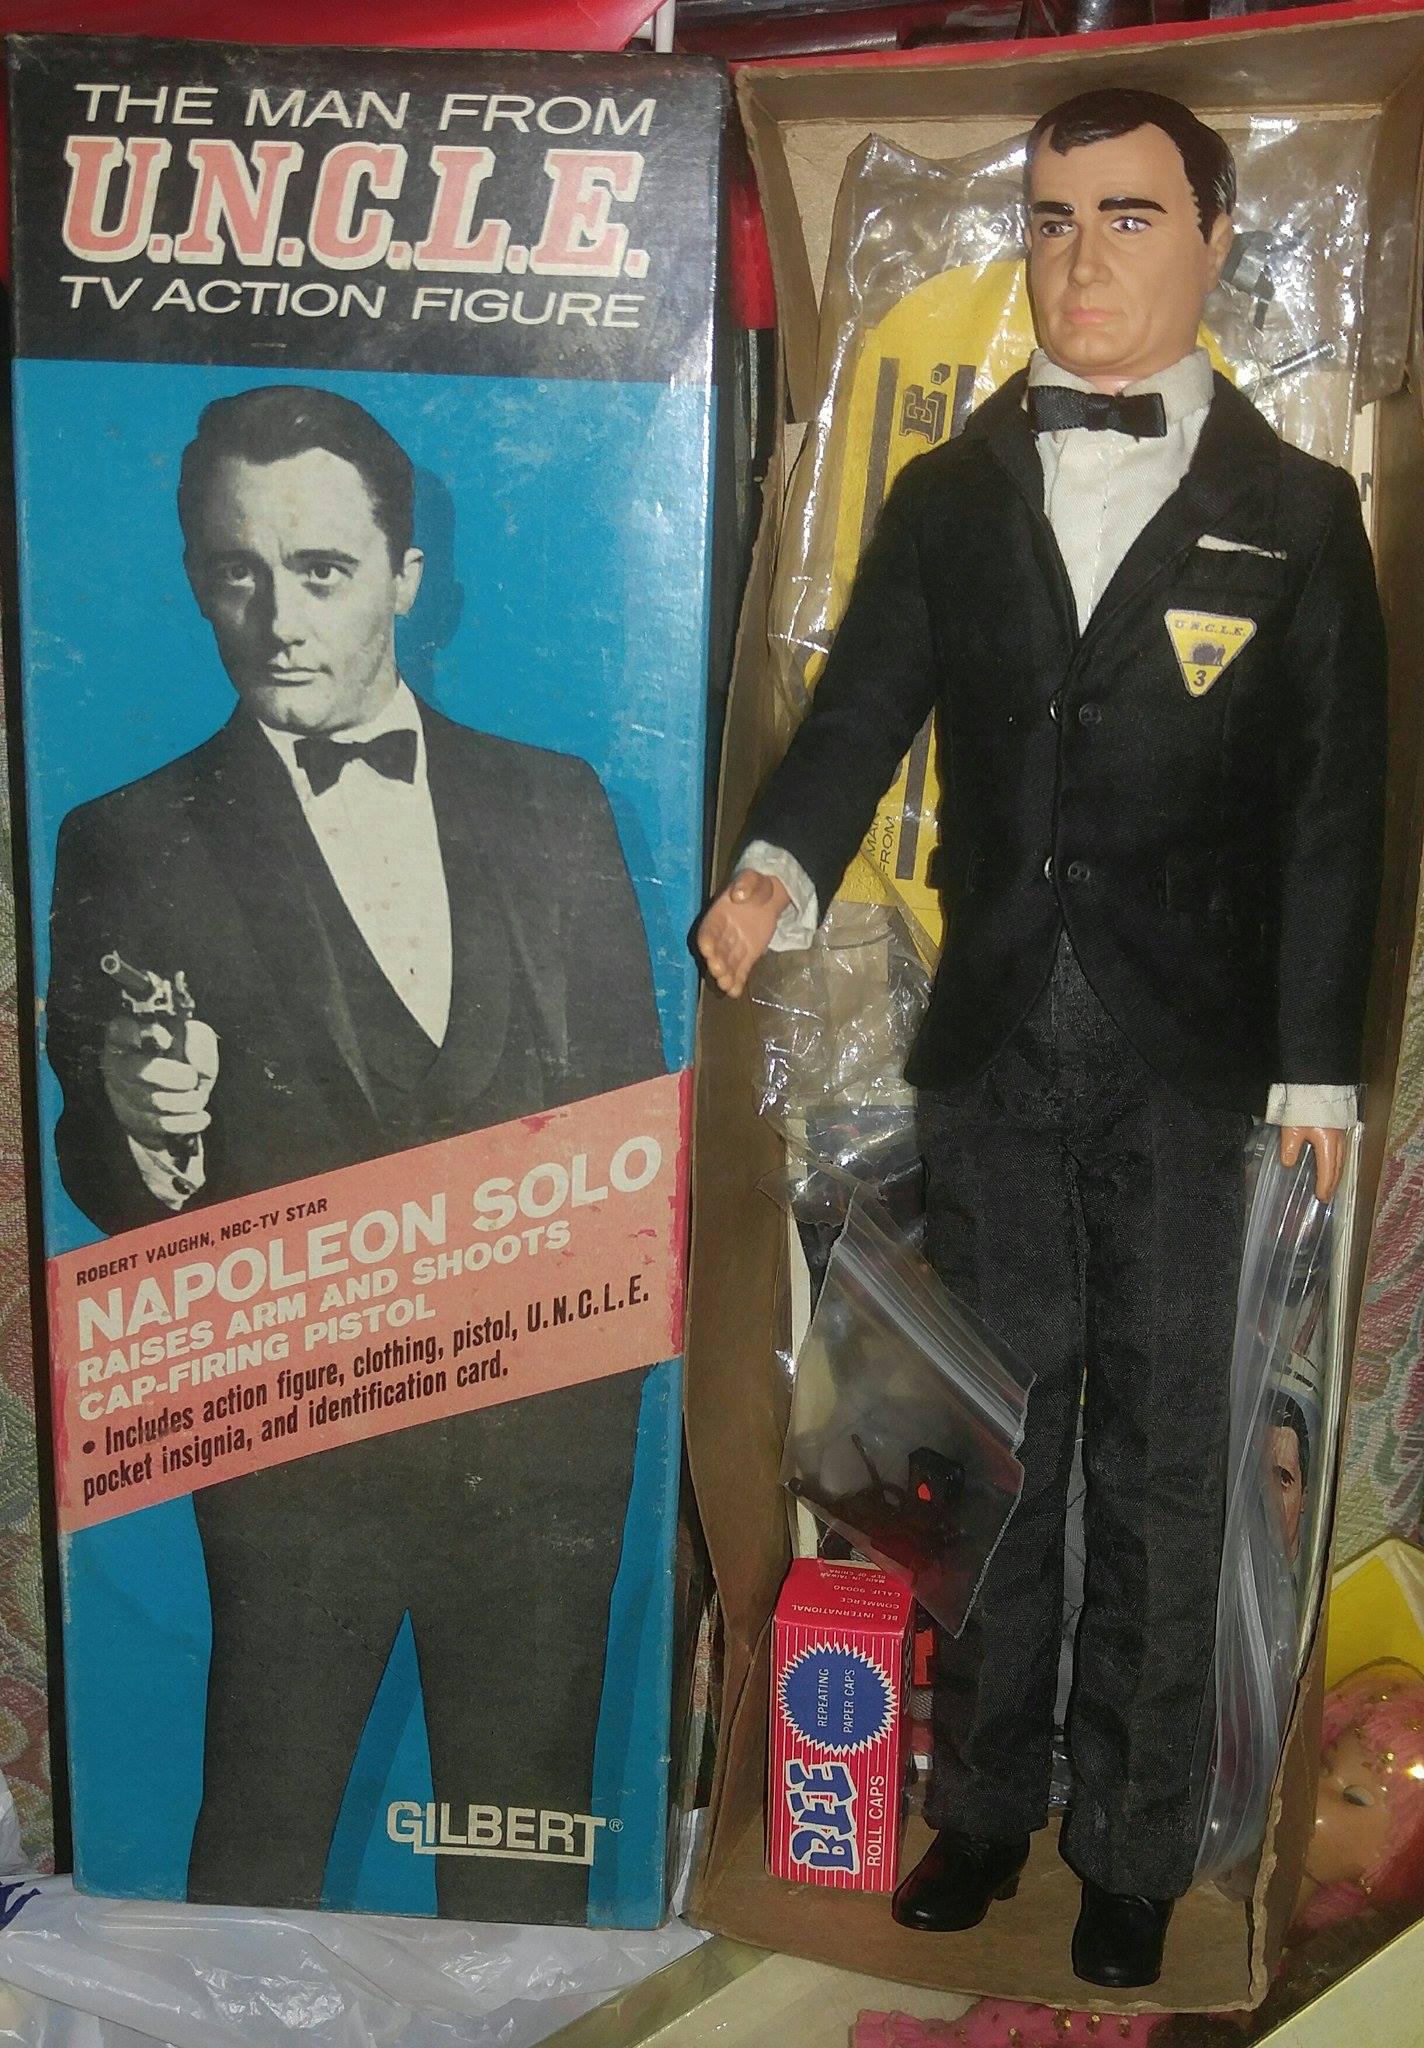 James Bond Tuxedo figure